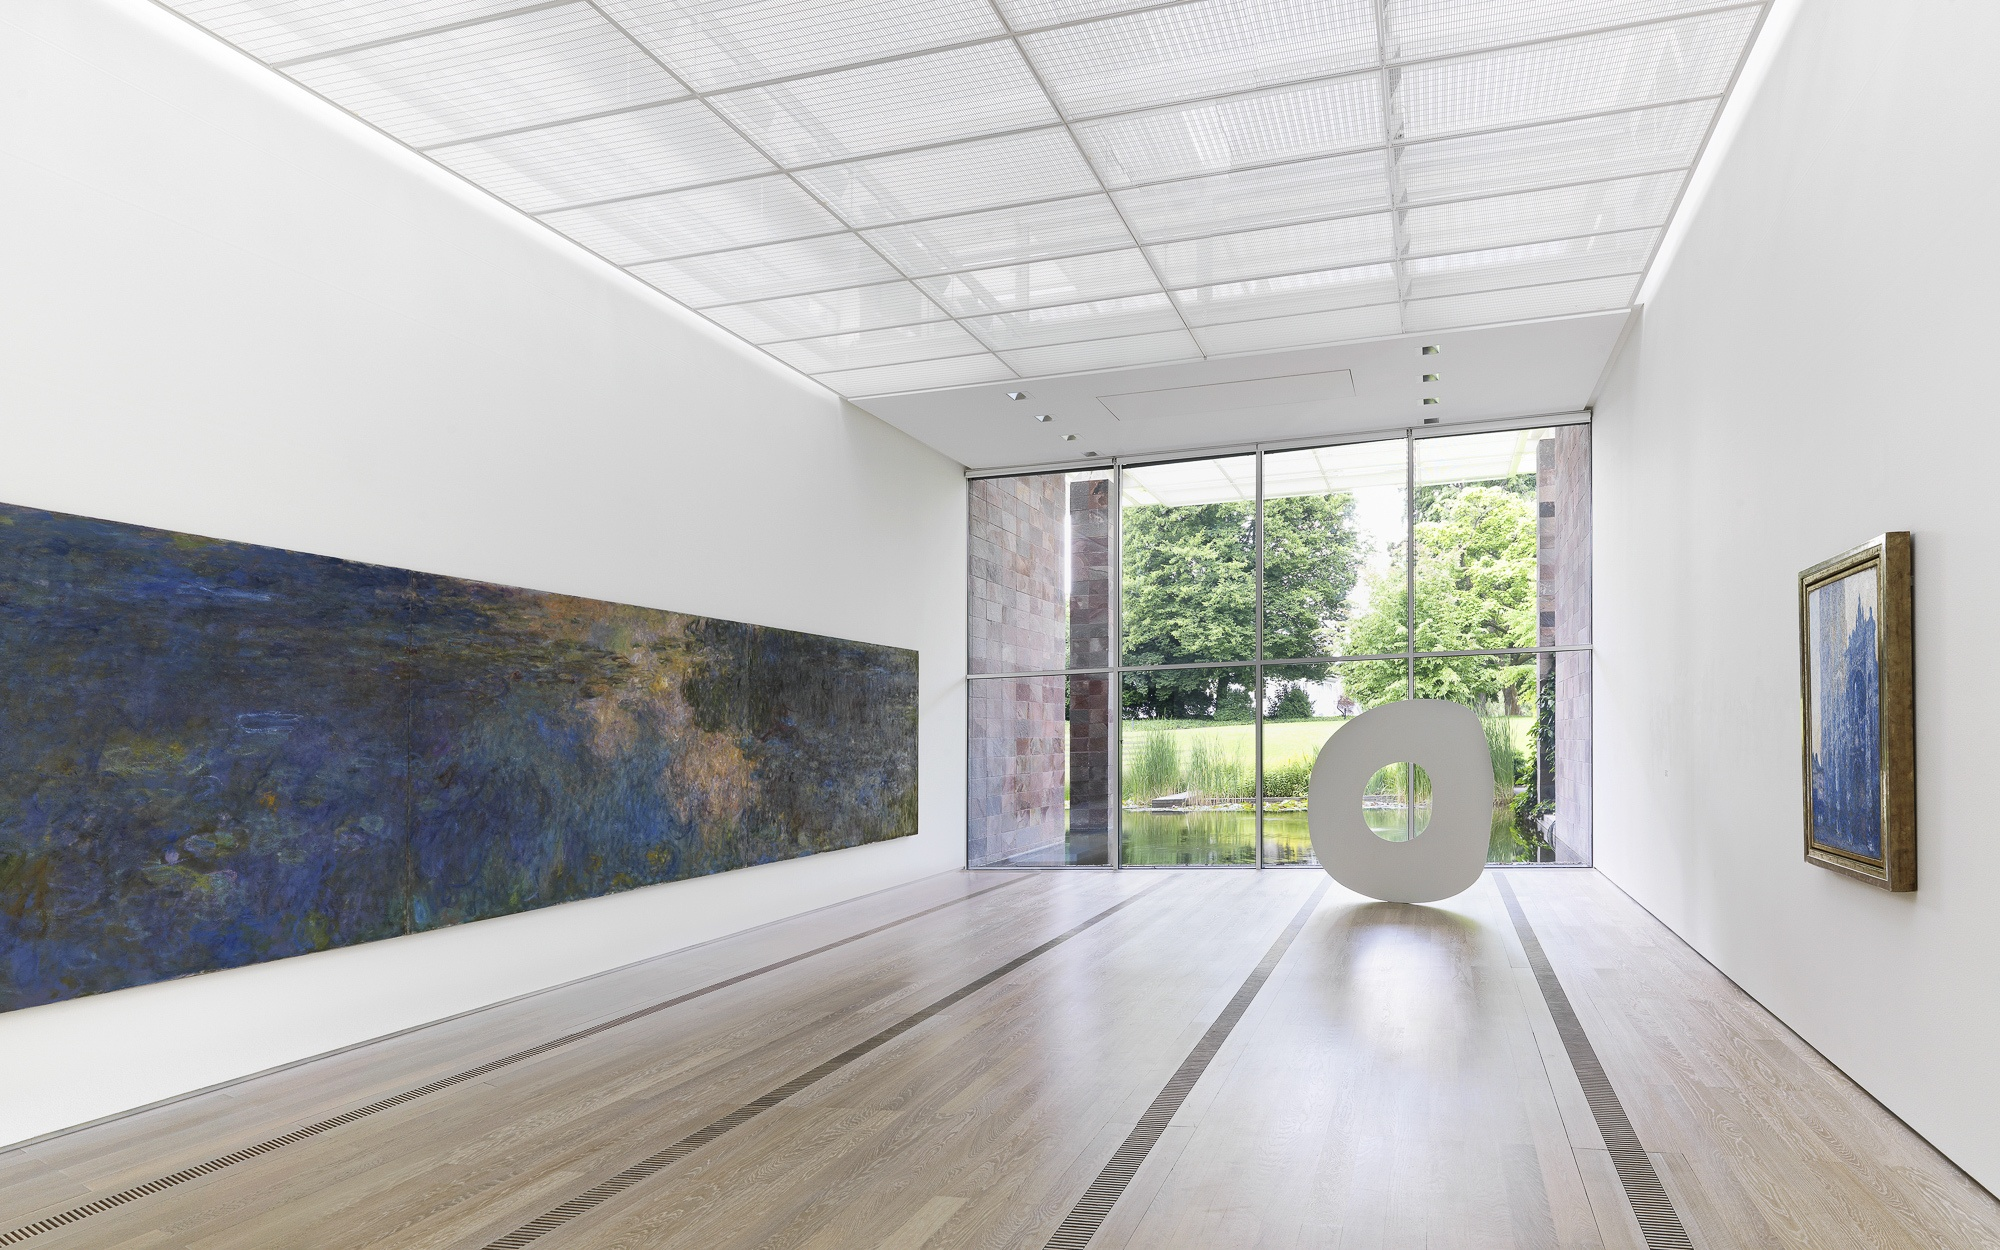 Fondation Beyeler, Monet Room